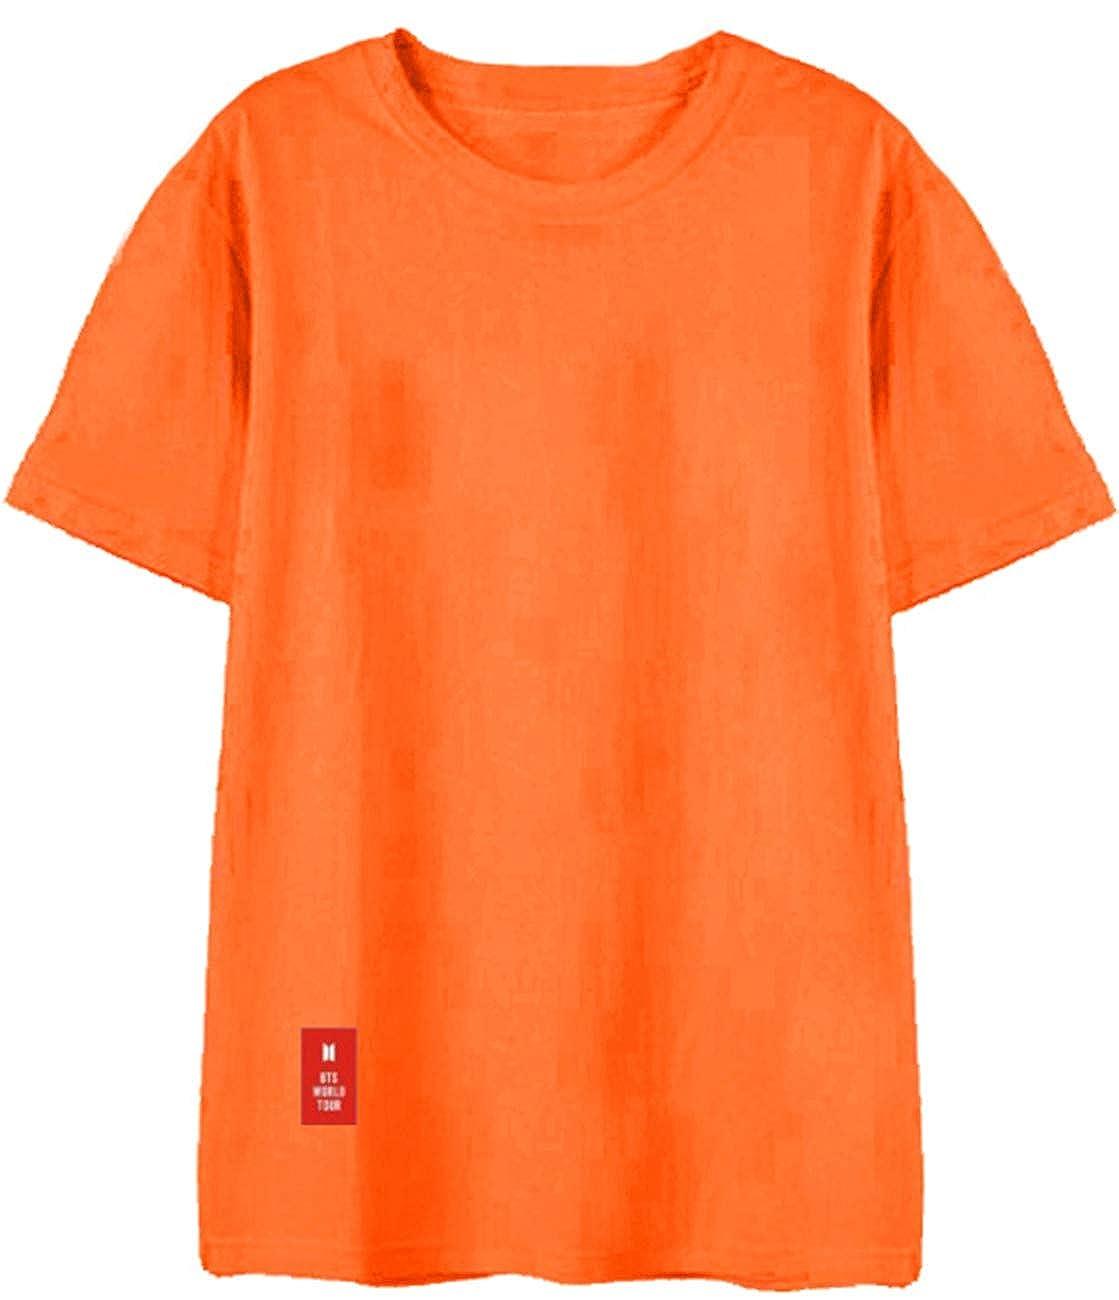 SERAPHY Unisexe T-Shirt Kpop Top Mode Bangtan Boys BTS Tshirt Love Yourself Chemises pour Army Jimin Jung Kook V